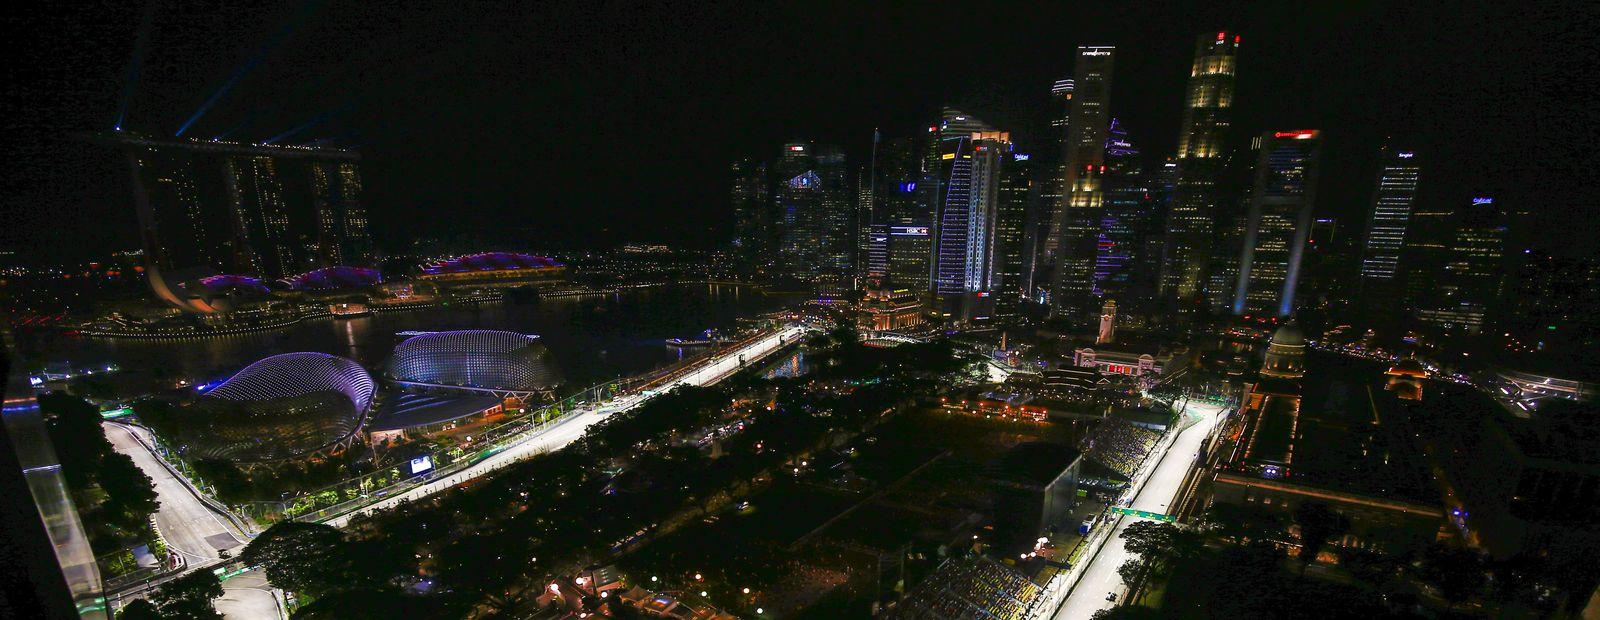 Circuito Singapur : Mclaren fórmula 1 gran premio de singapur